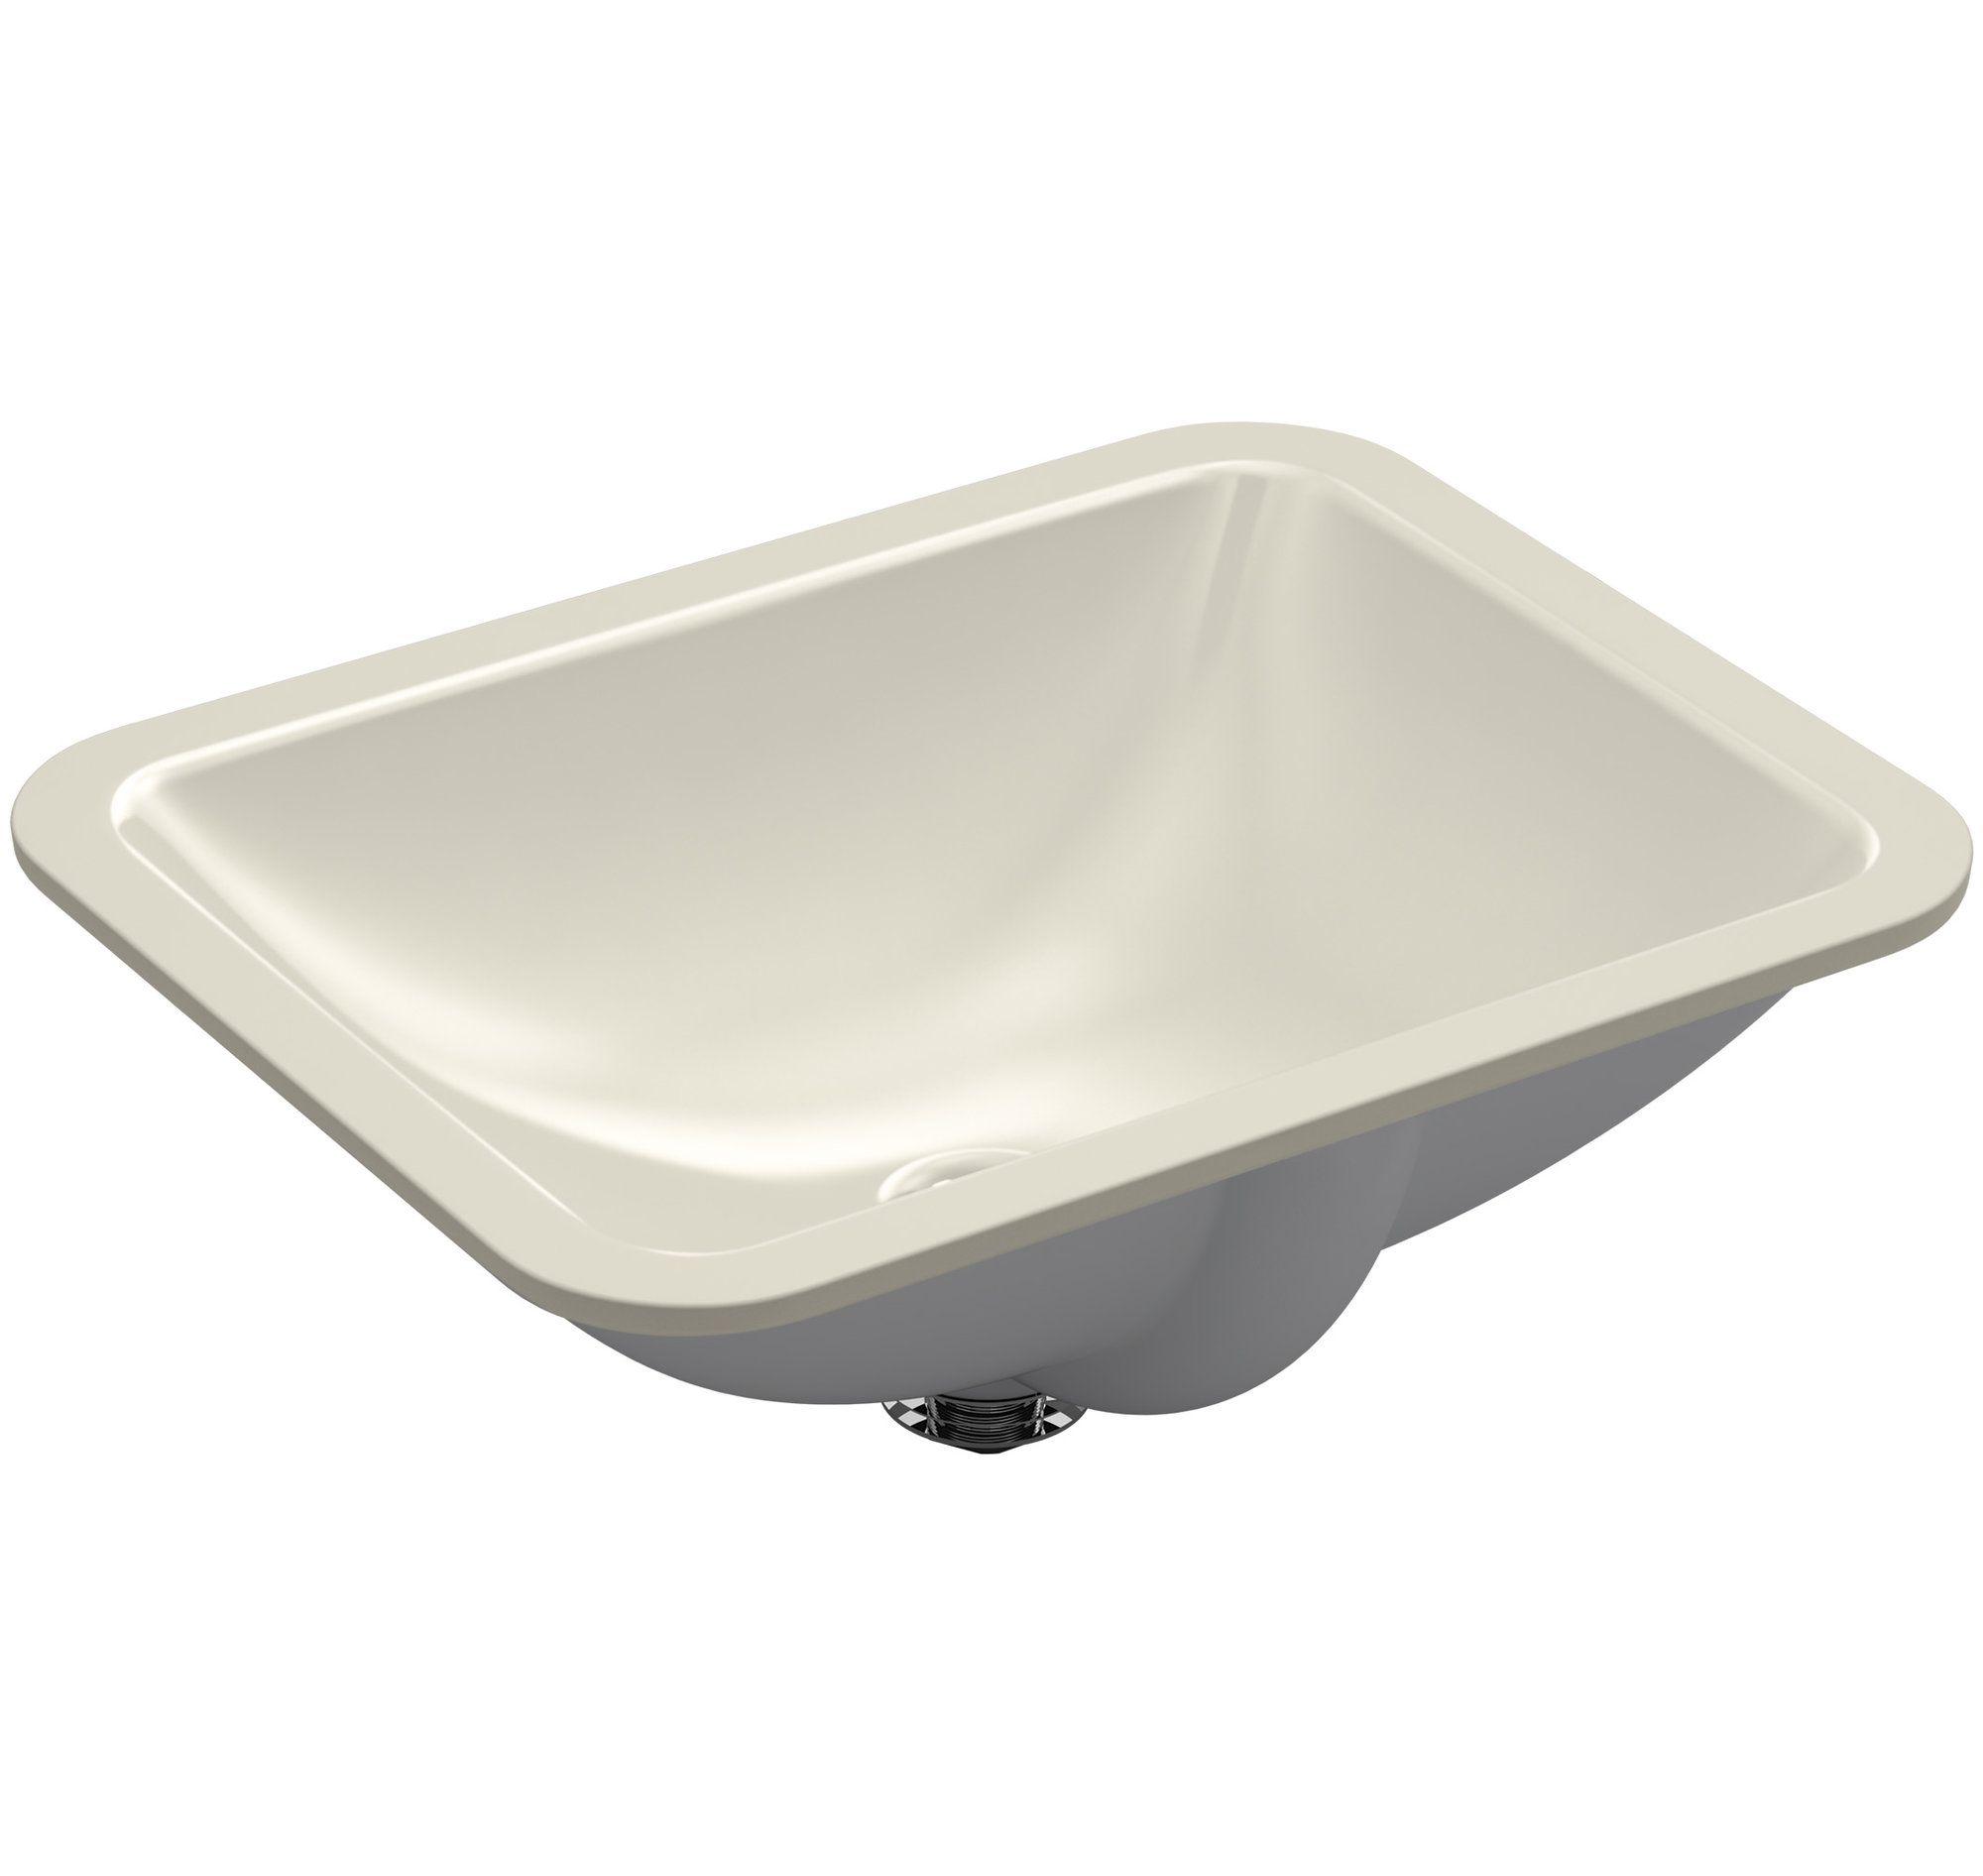 Caxton Rectangle Undermount Bathroom Sink Undermount Bathroom